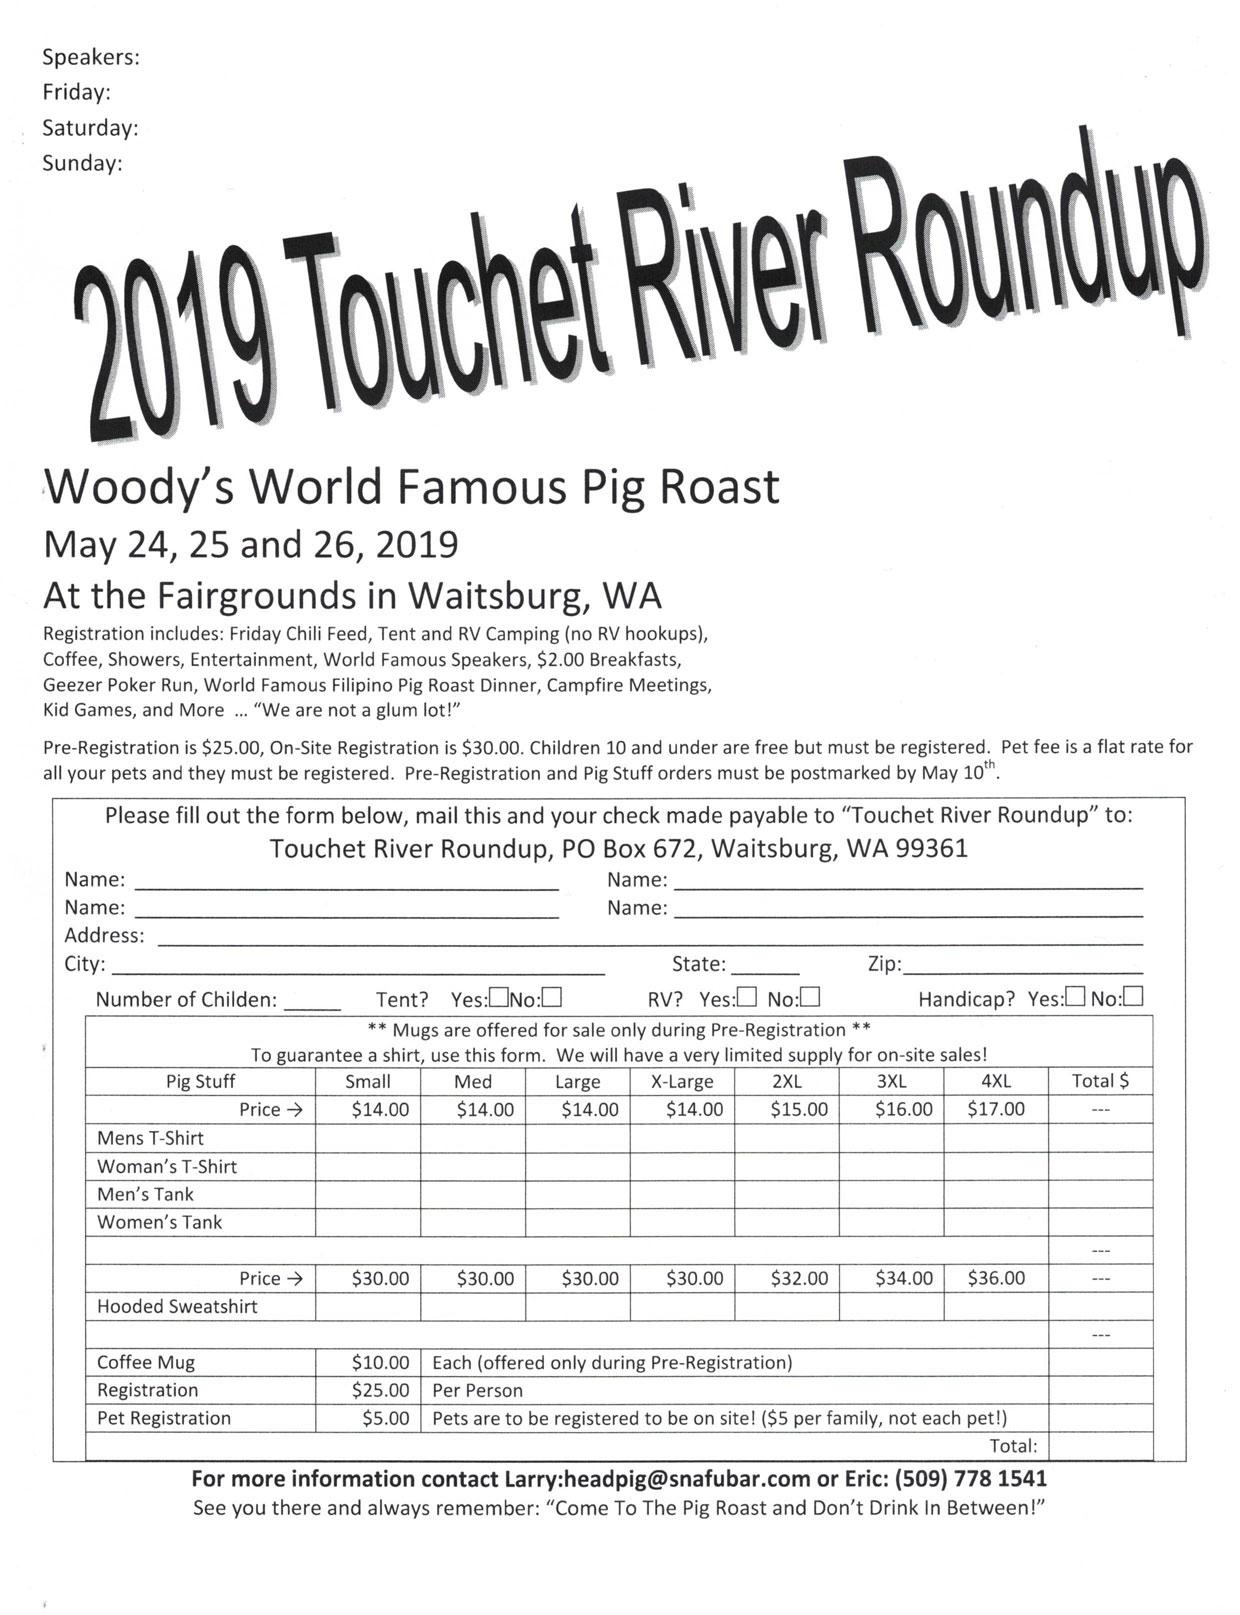 34th Annual Touchet River Outdoor Roundup Waitsburg,WA